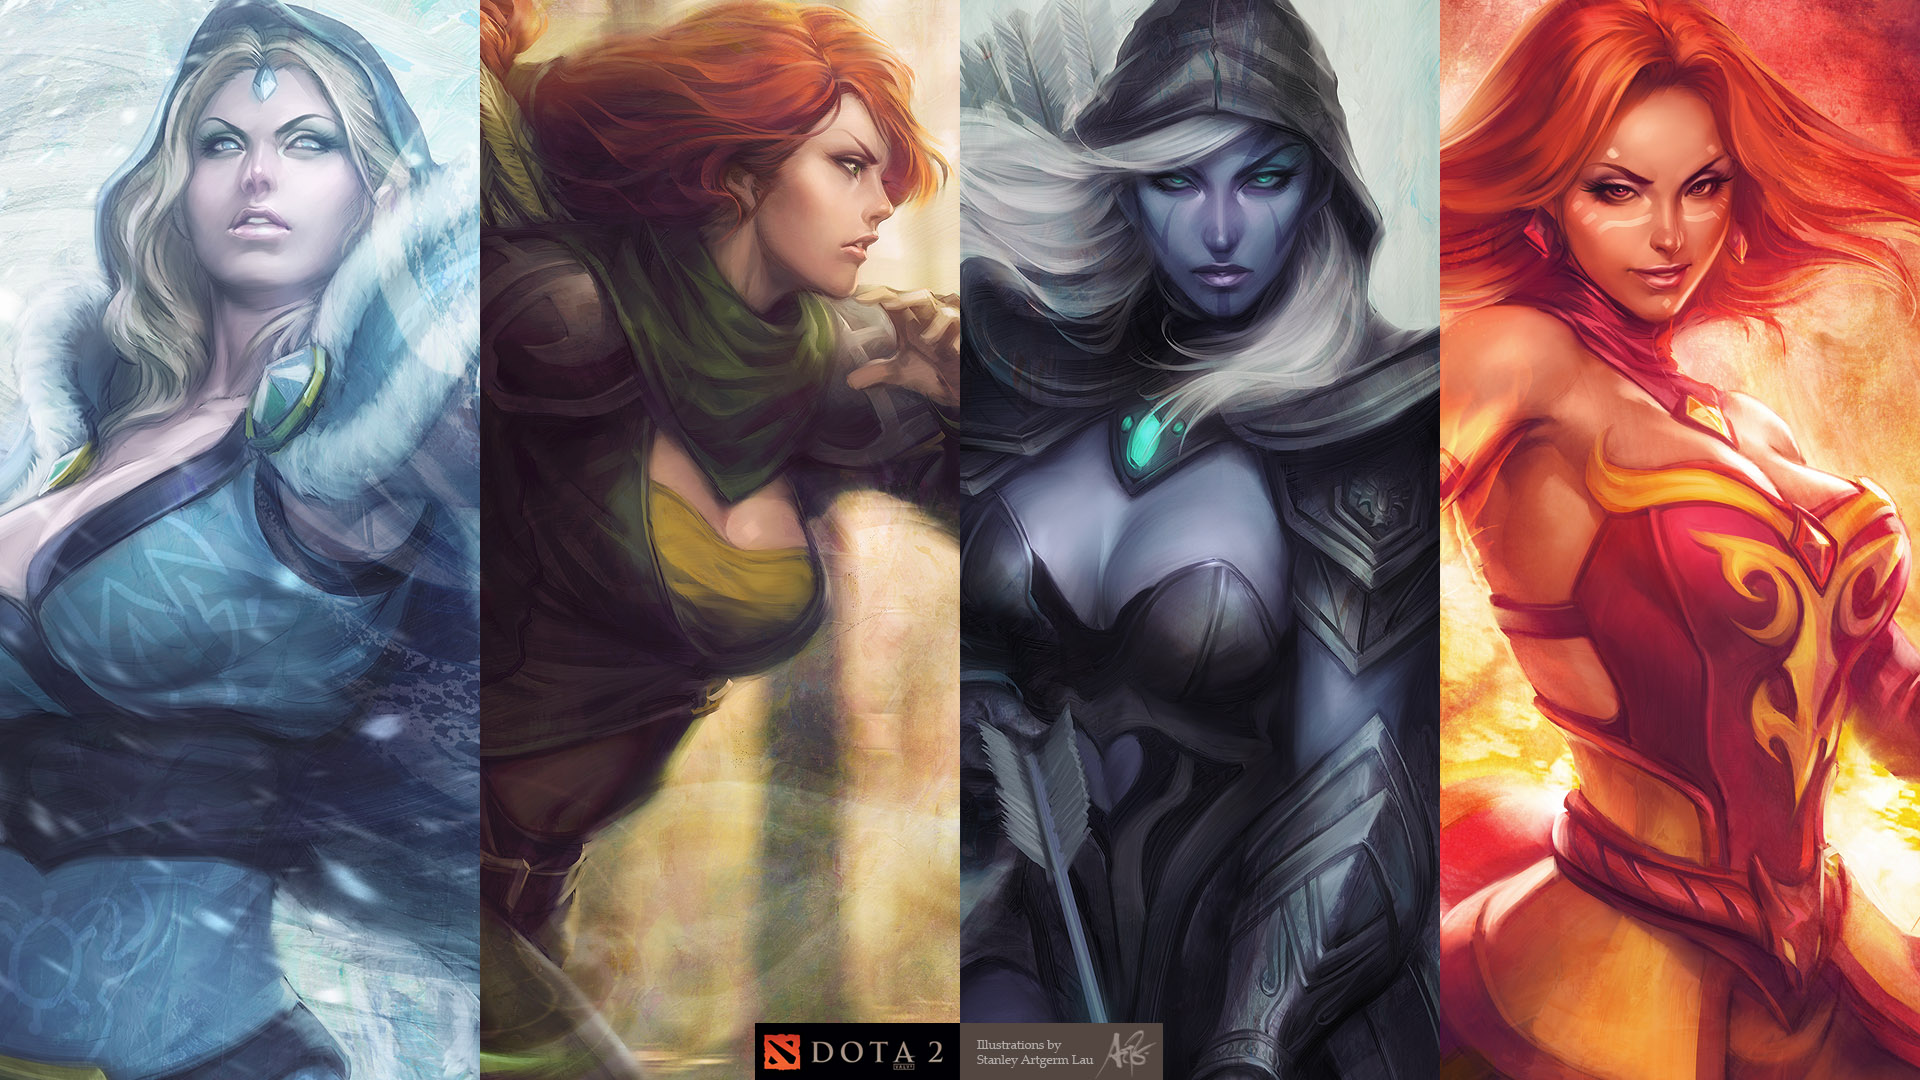 DotA2 Heroines by Artgerm